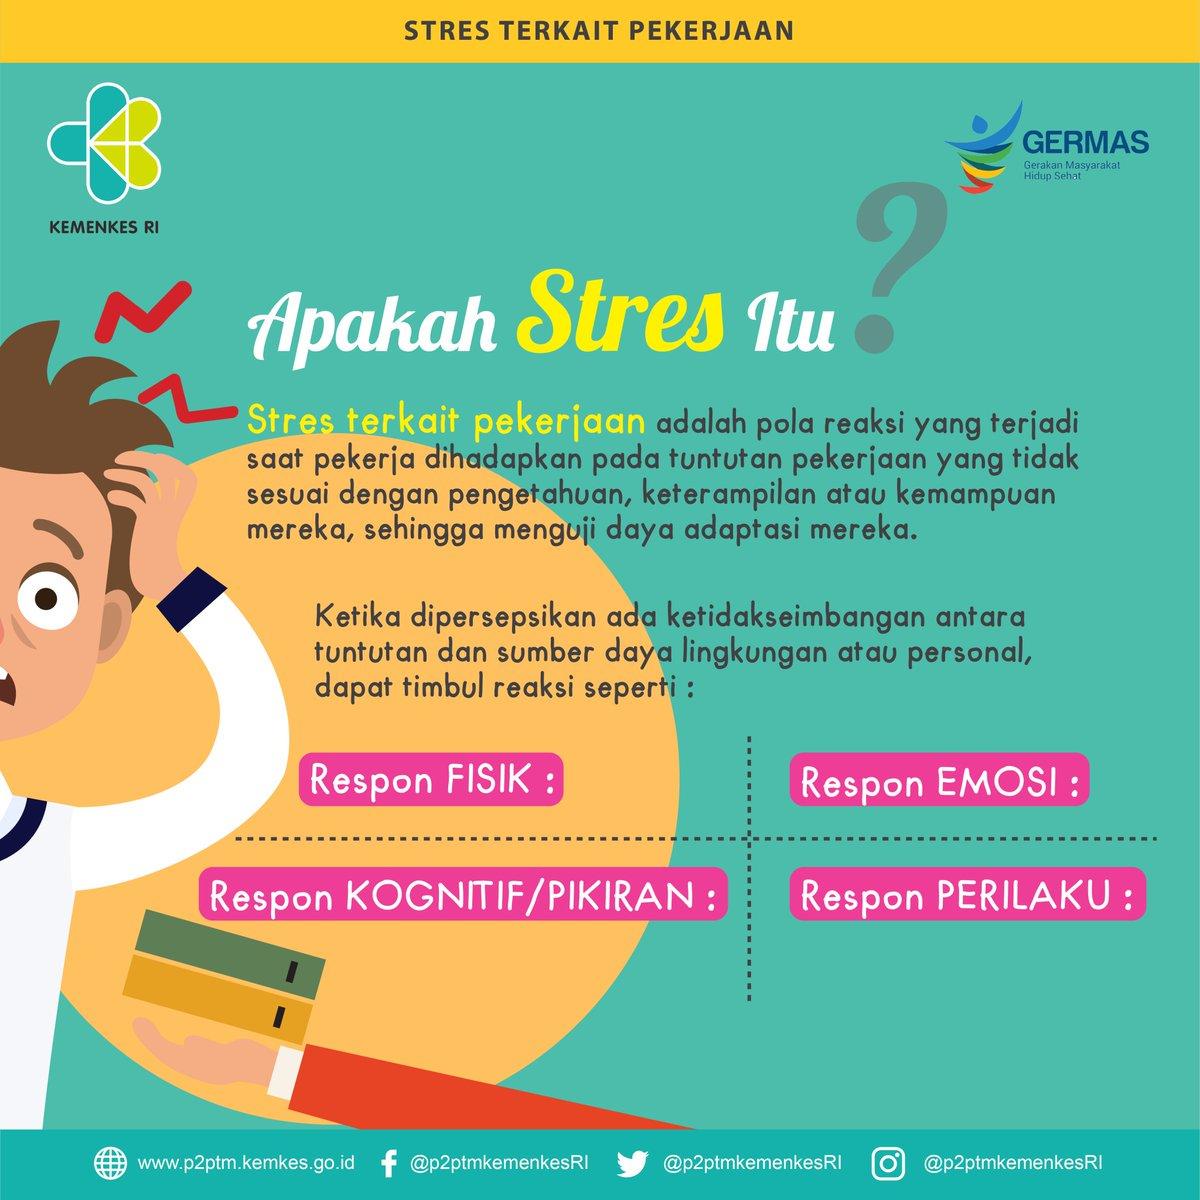 Stres Terkait Pekerjaan, Apakah Stres itu